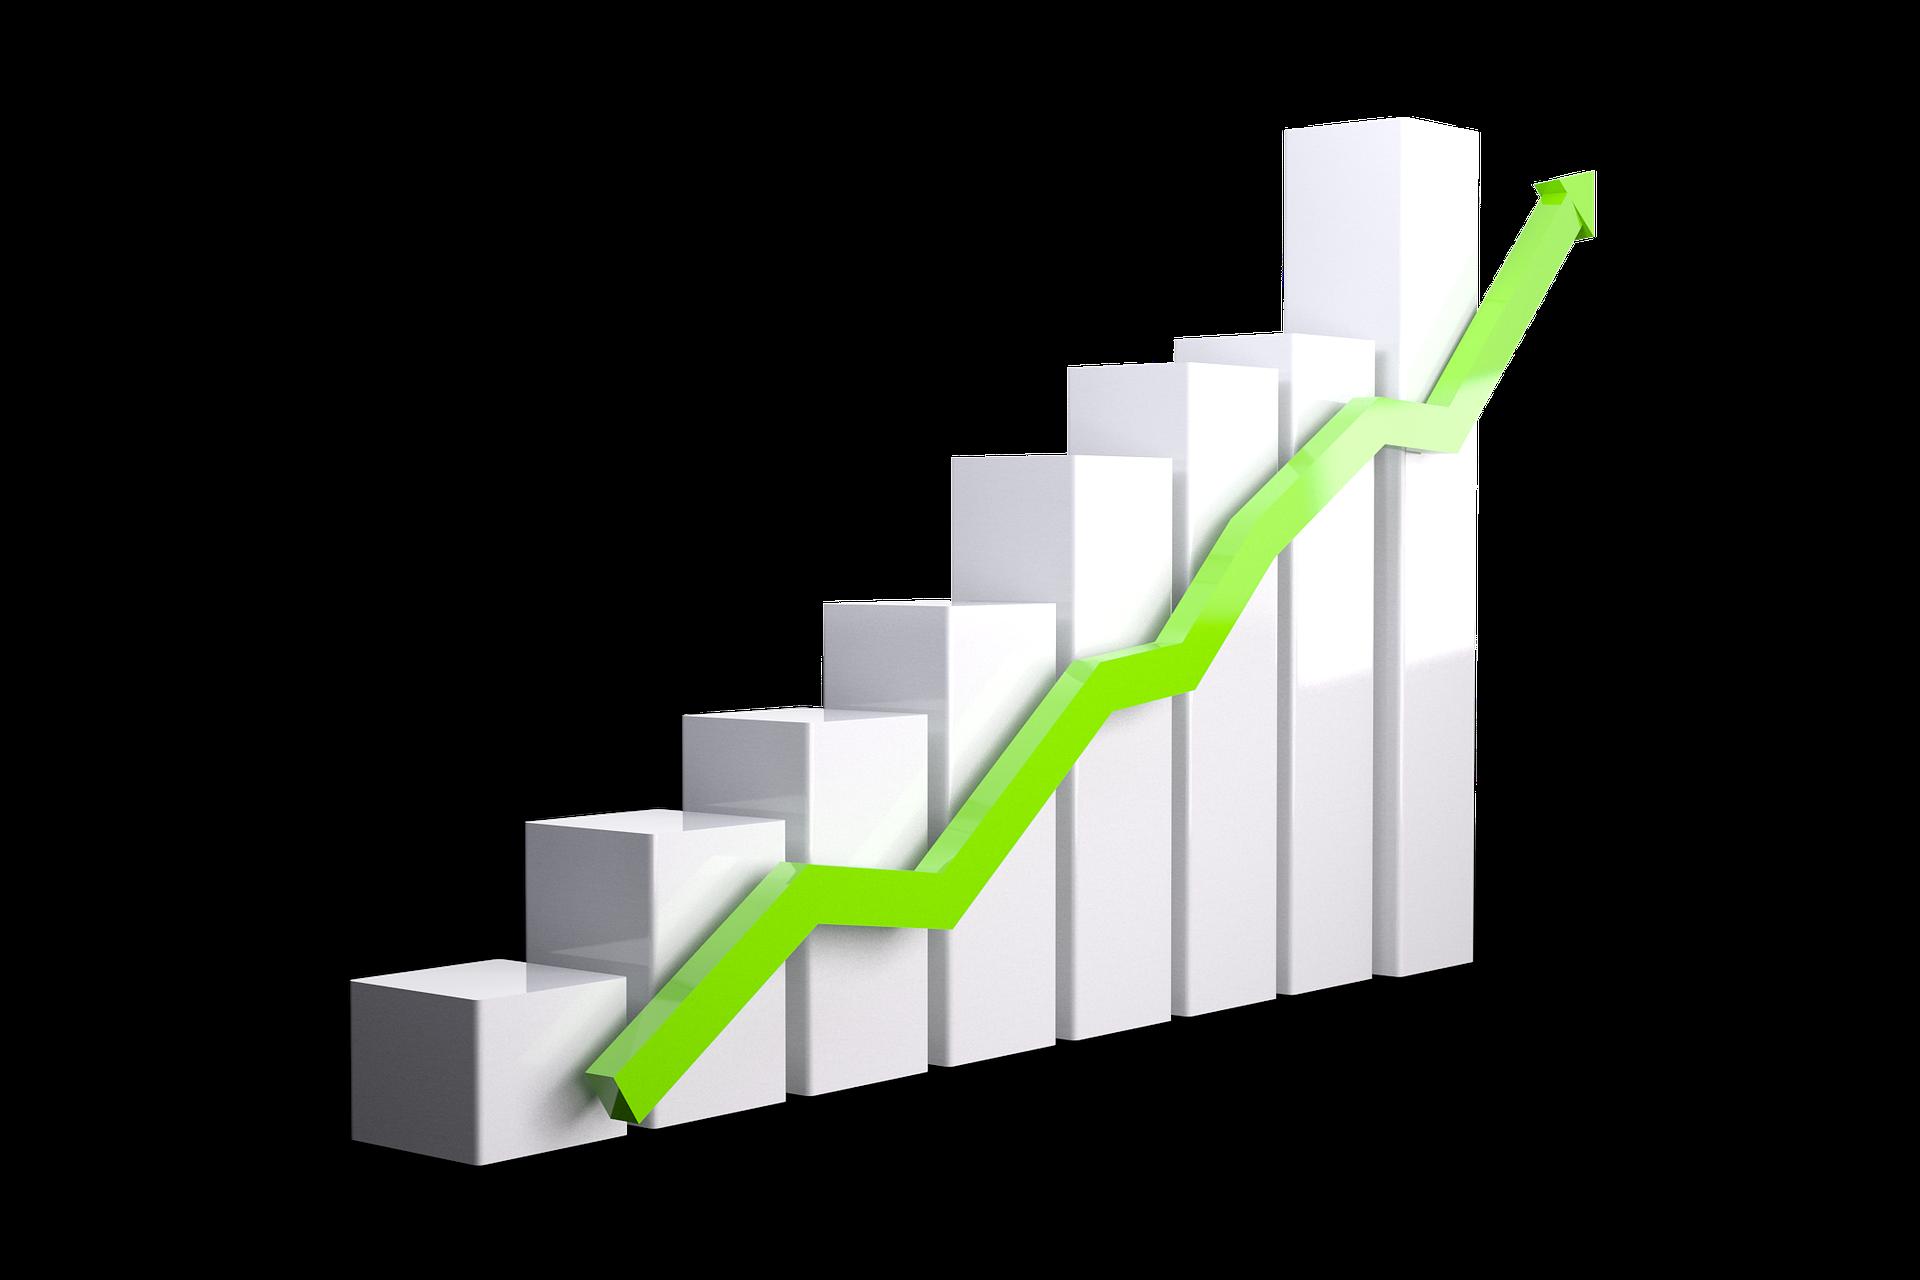 Zinsen steigen - Finanzierung 4 You